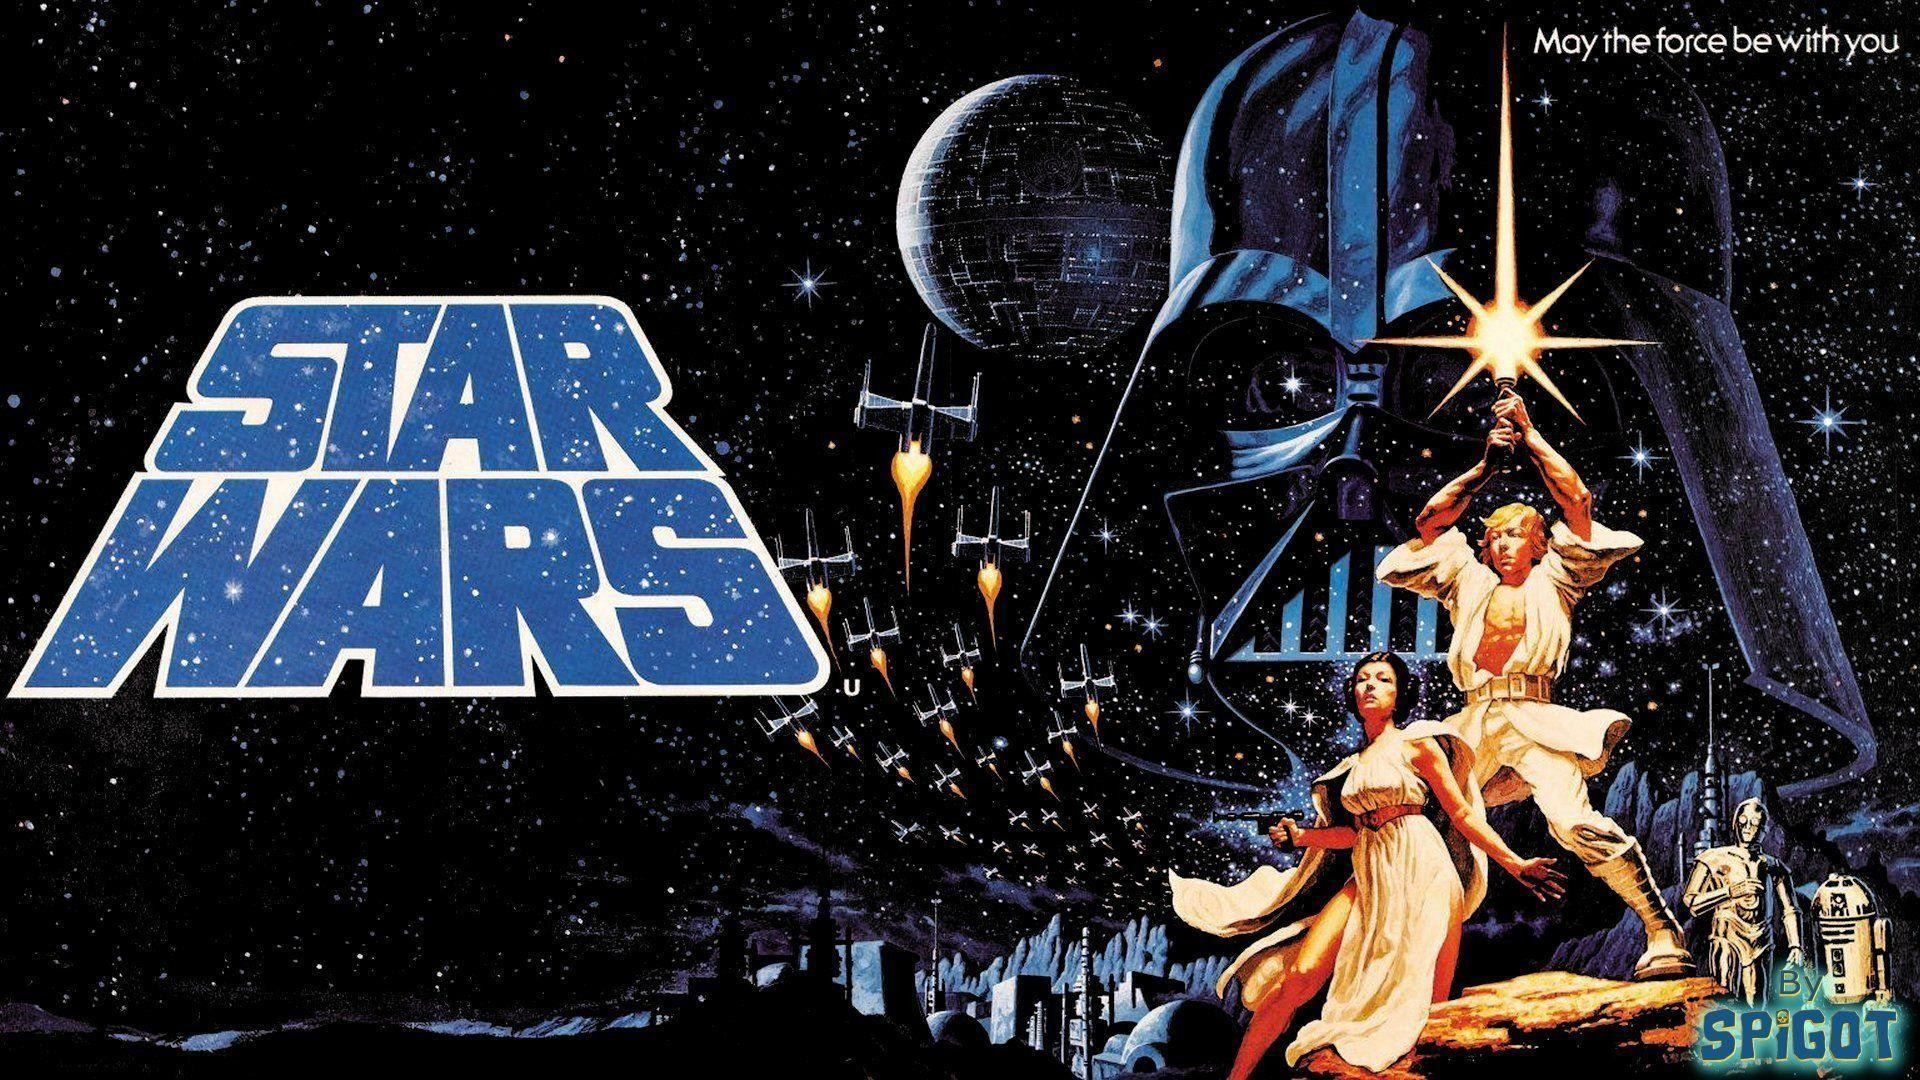 star wars 7 free download